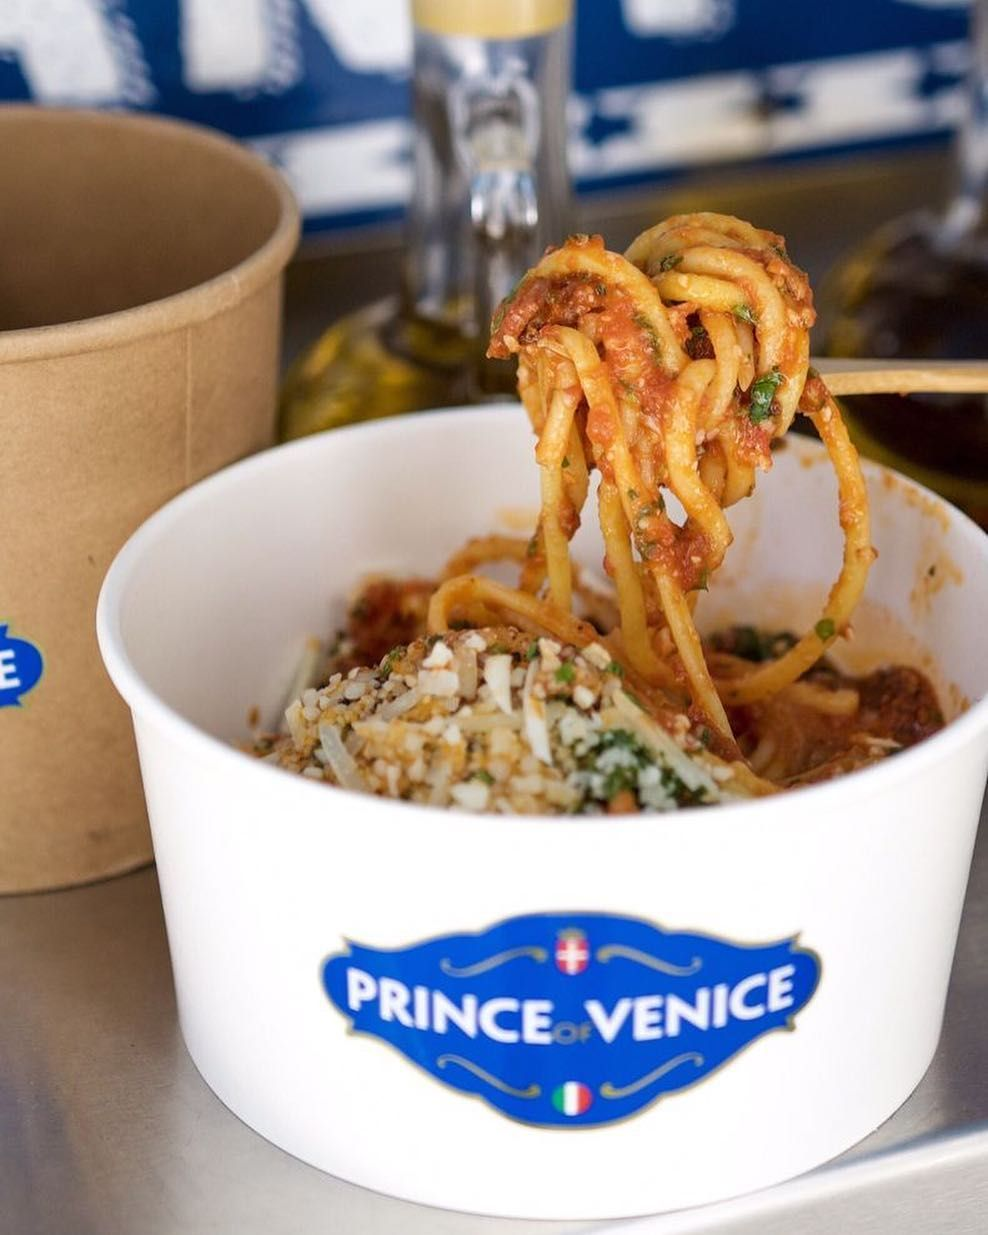 Park Art|My WordPress Blog_Prince Of Venice Food Truck Instagram